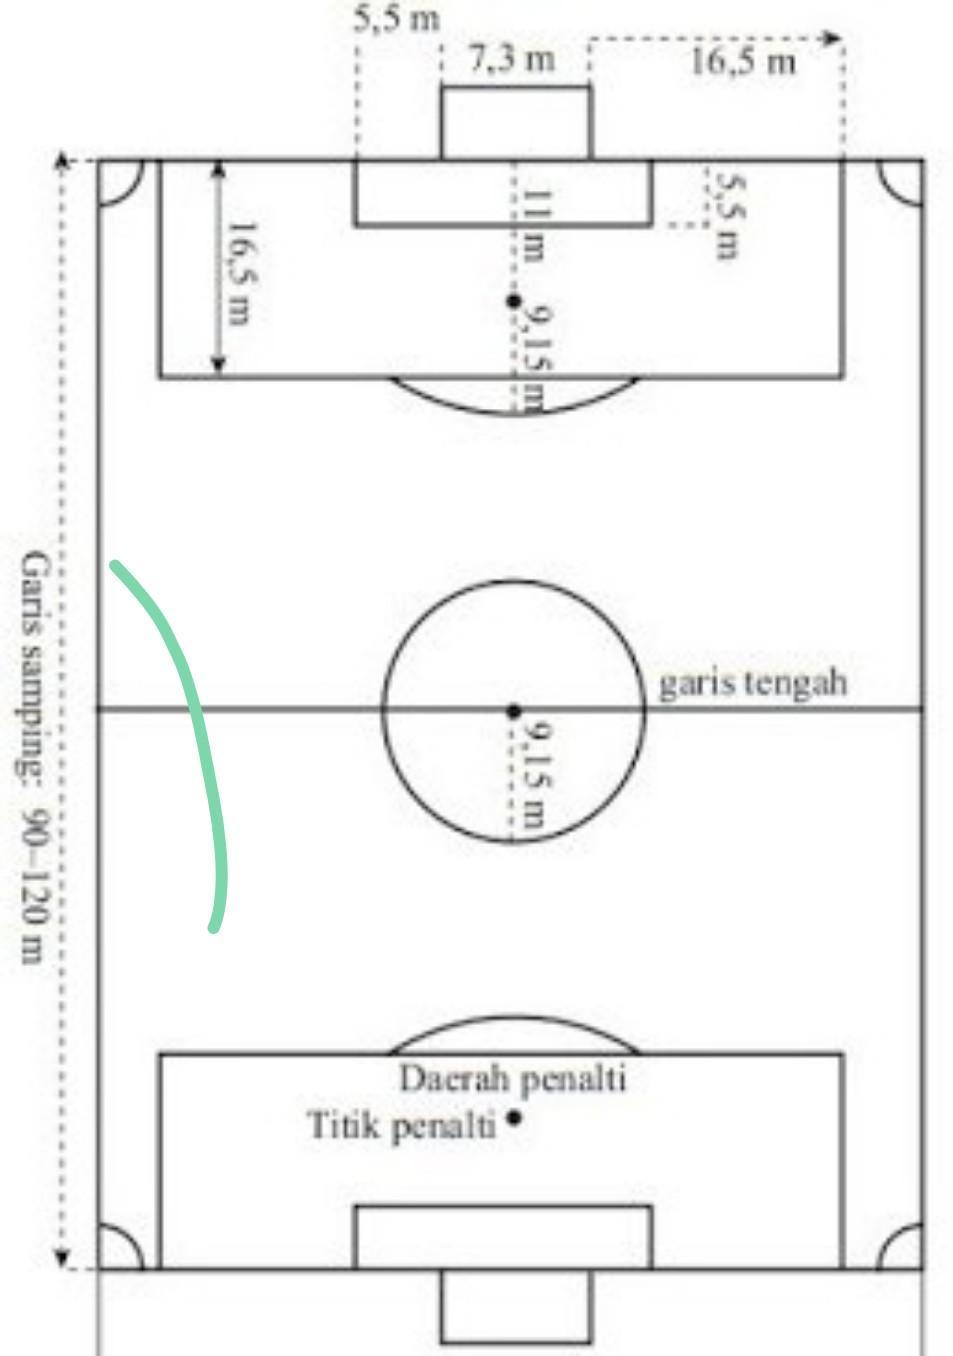 Ukuran Lapangan Sepak Bola Dan Bolanya Berdasarakan Penjelasanya Tolong Dijawab Ya Brainly Co Id